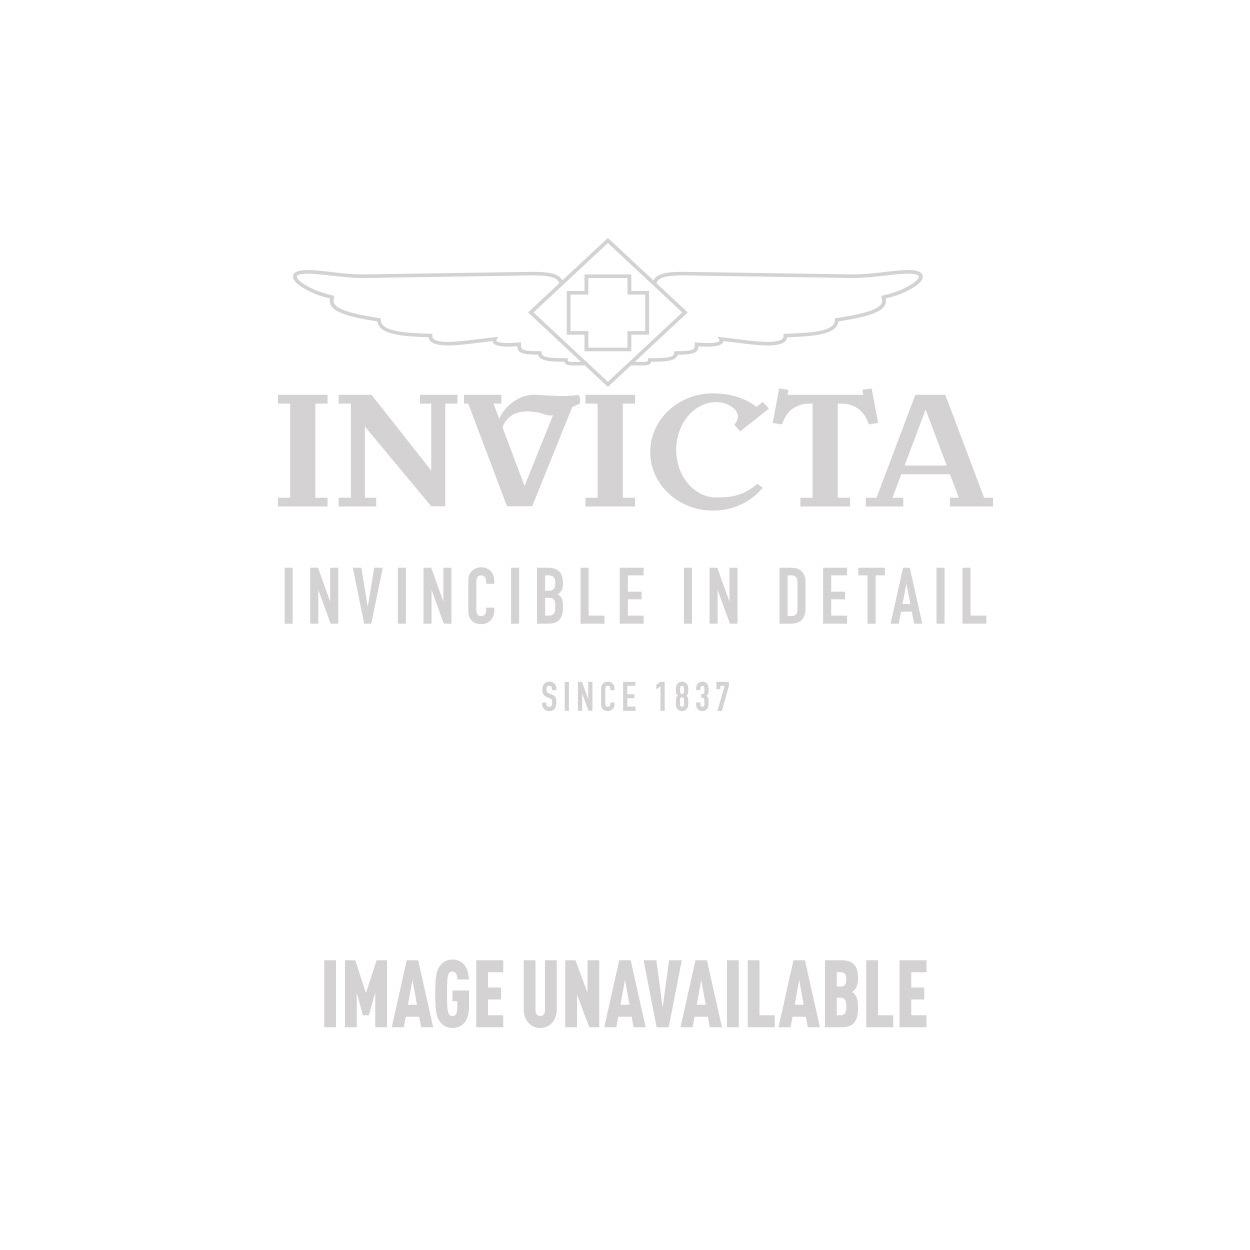 10268eb66 Invicta Star Wars Limited Edition Boba Fett Mens Quartz 58 mm Green Case  Grey Dial - Model 28067